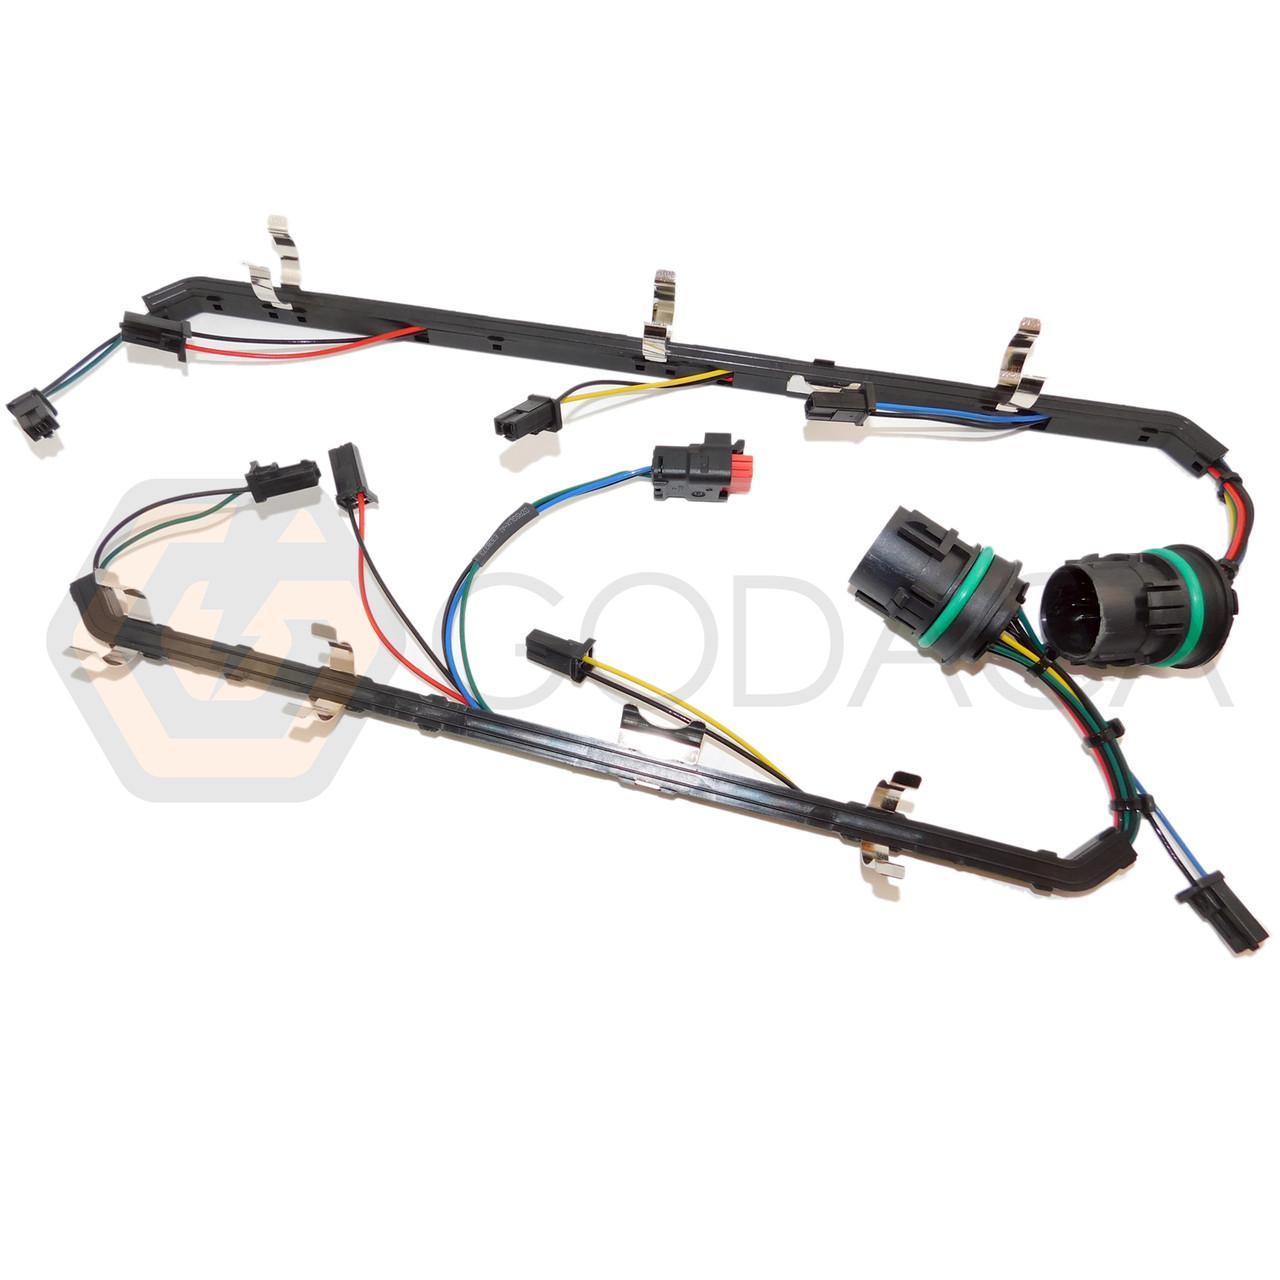 1x wiring harness for ford fuel injector 08-10 6 4l powerstroke diesel -  godaca, llc